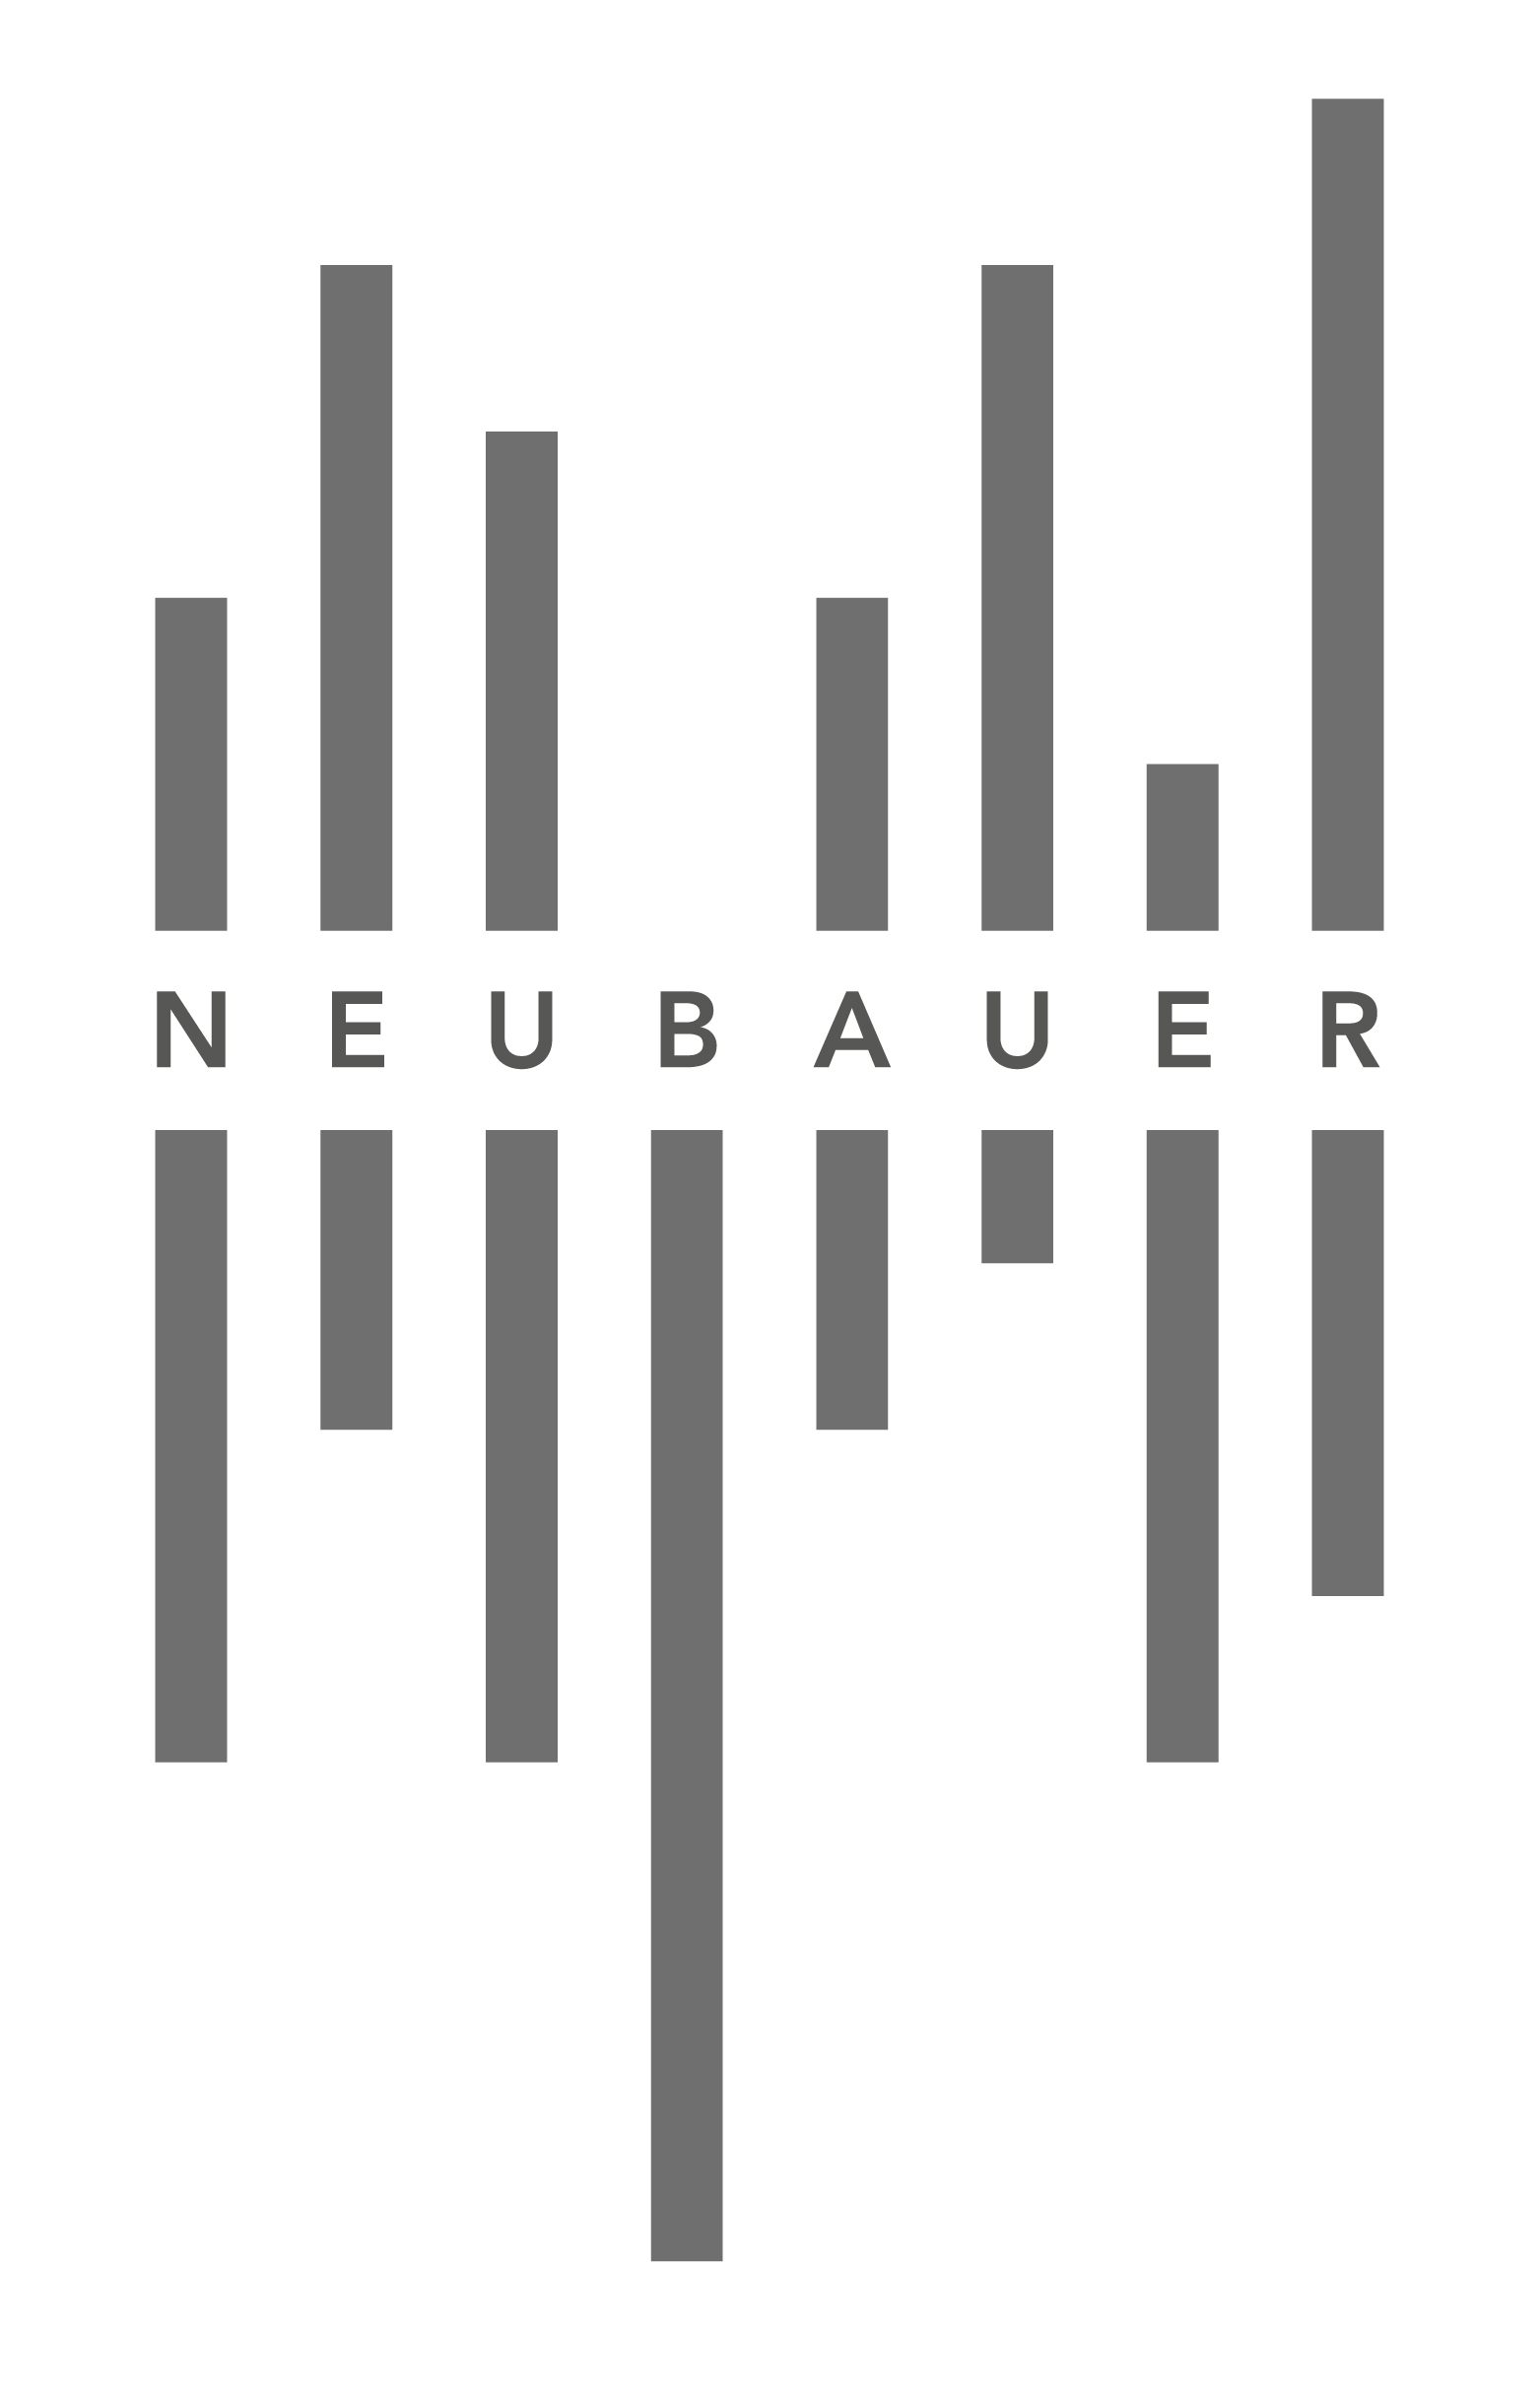 neubauerdesign